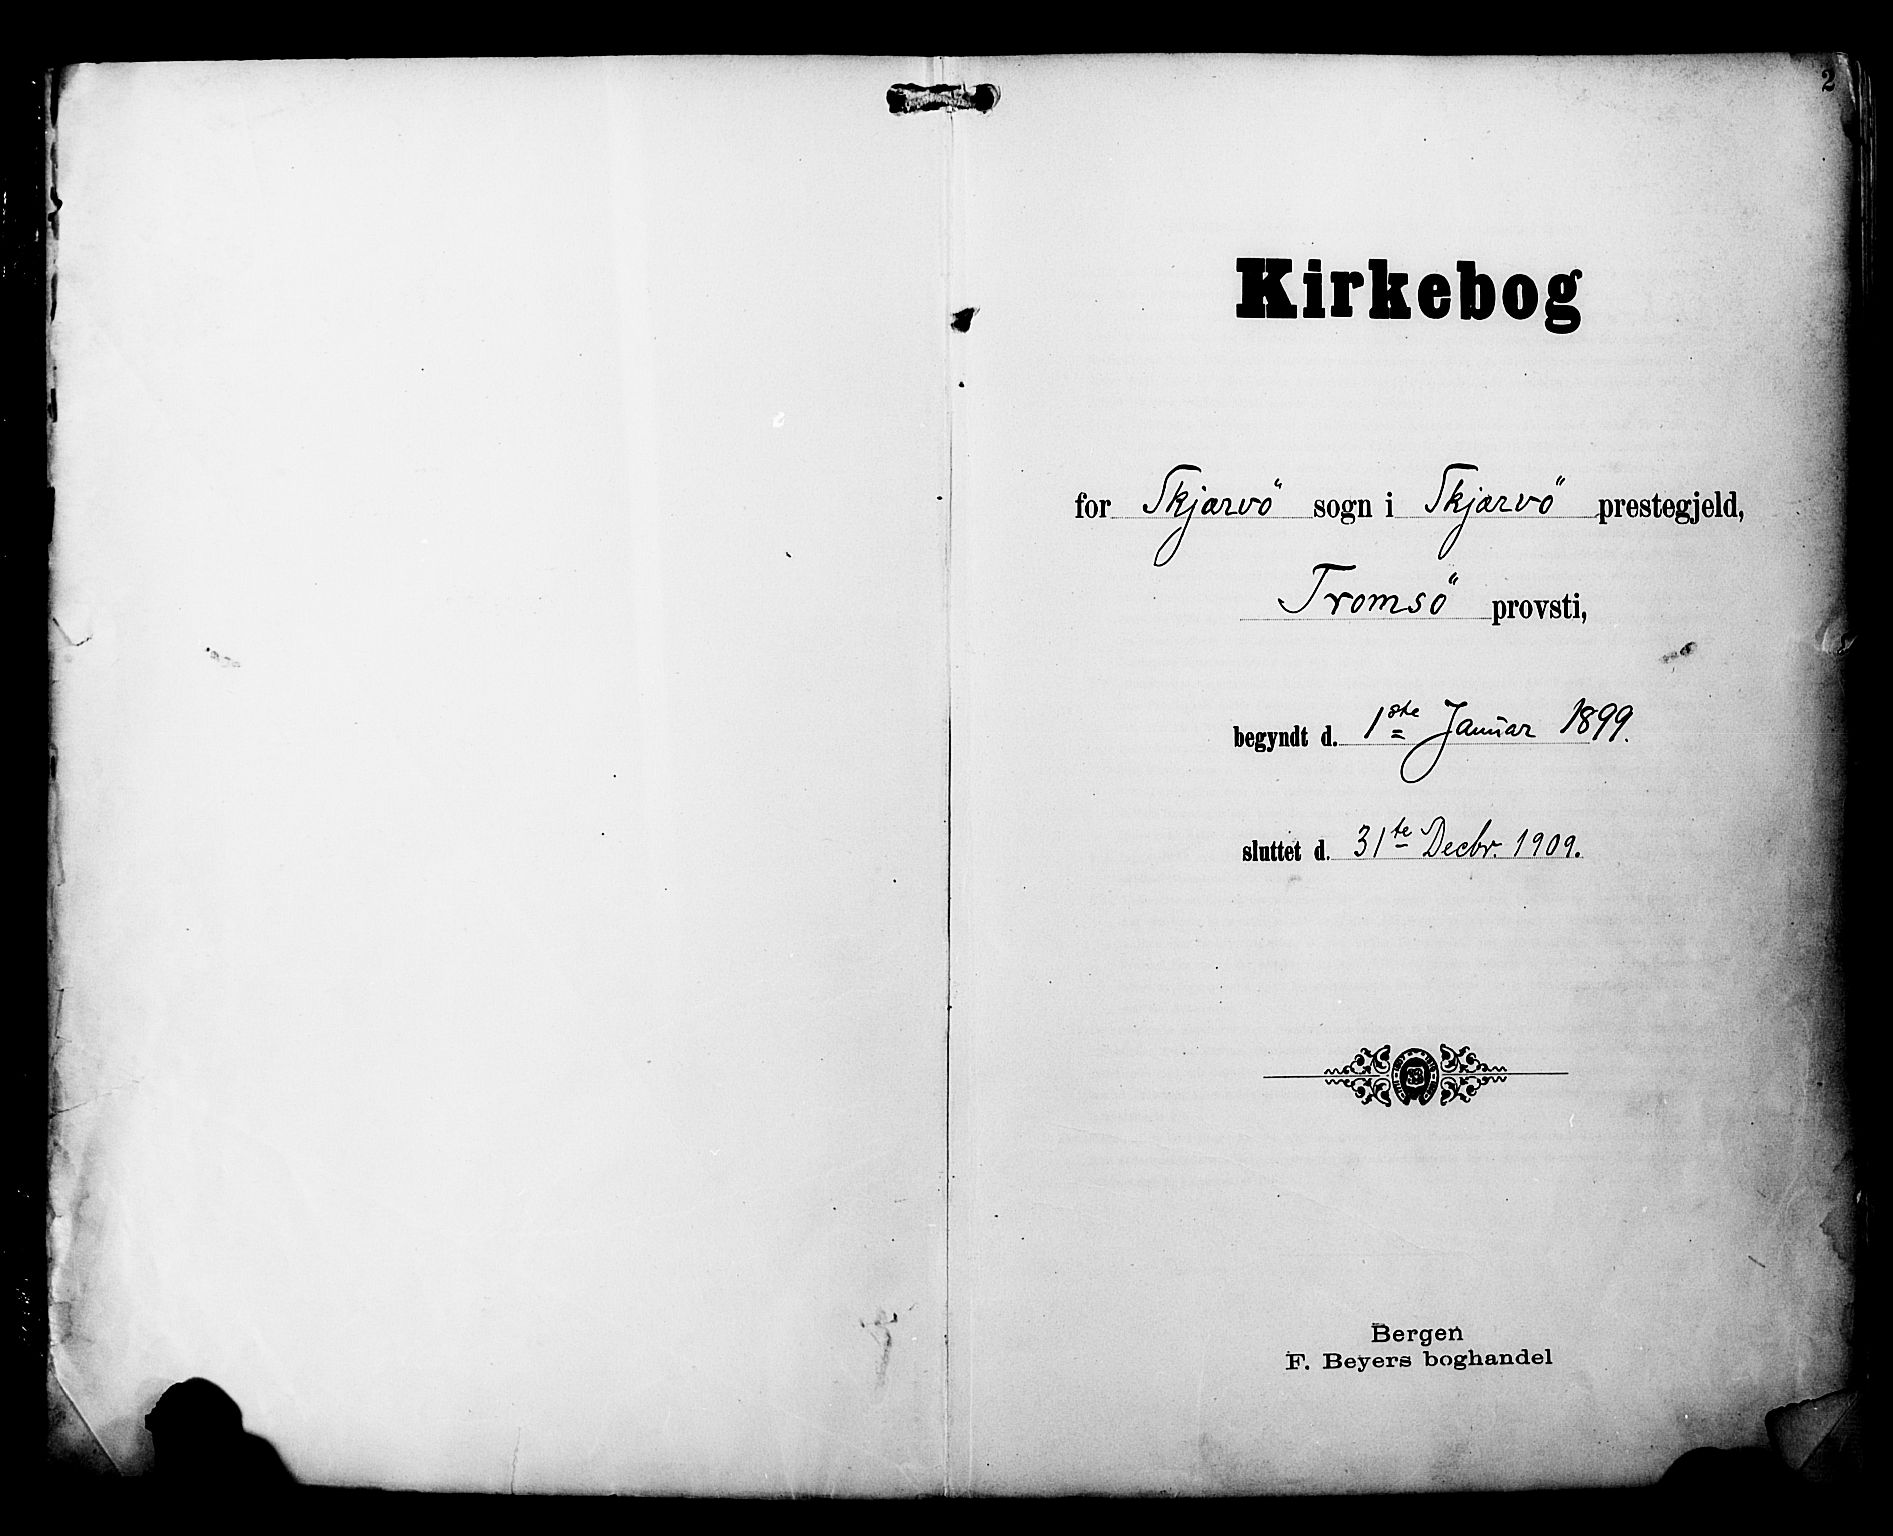 SATØ, Skjervøy sokneprestkontor, H/Ha/Haa/L0015kirke: Ministerialbok nr. 15, 1899-1909, s. 2